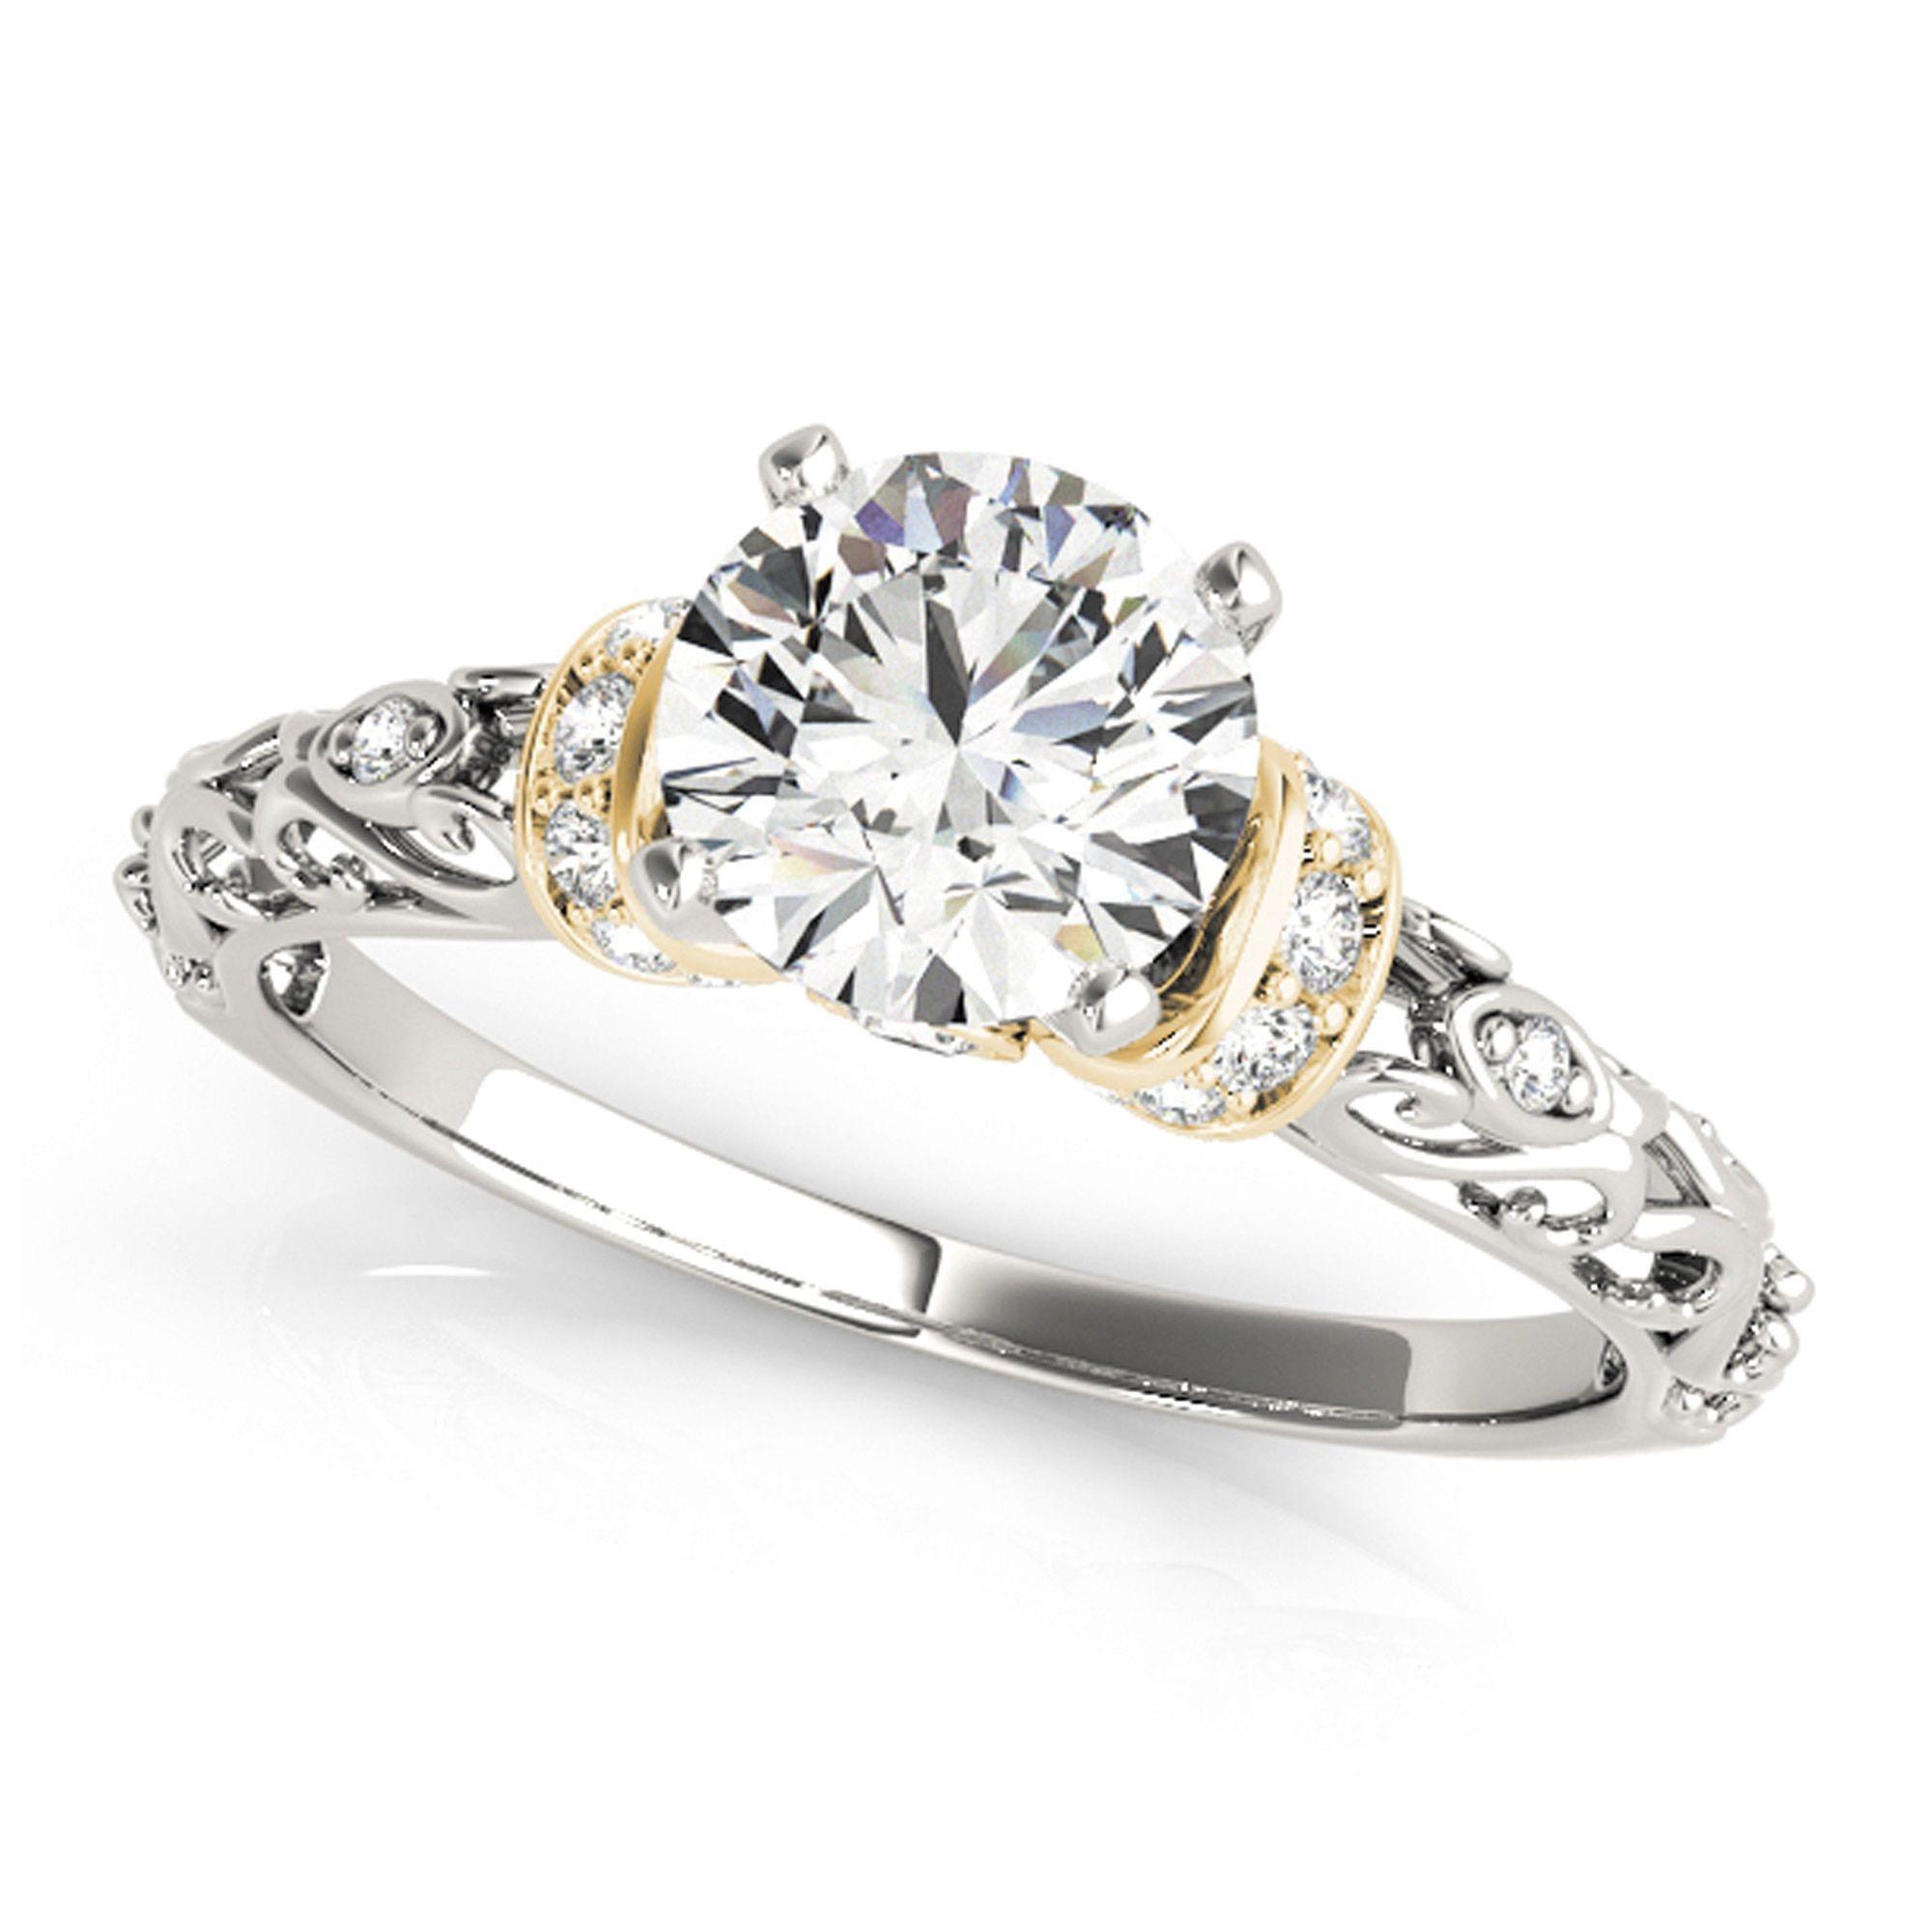 Transcendent brilliance k gold ct tdw diamond petite vintage